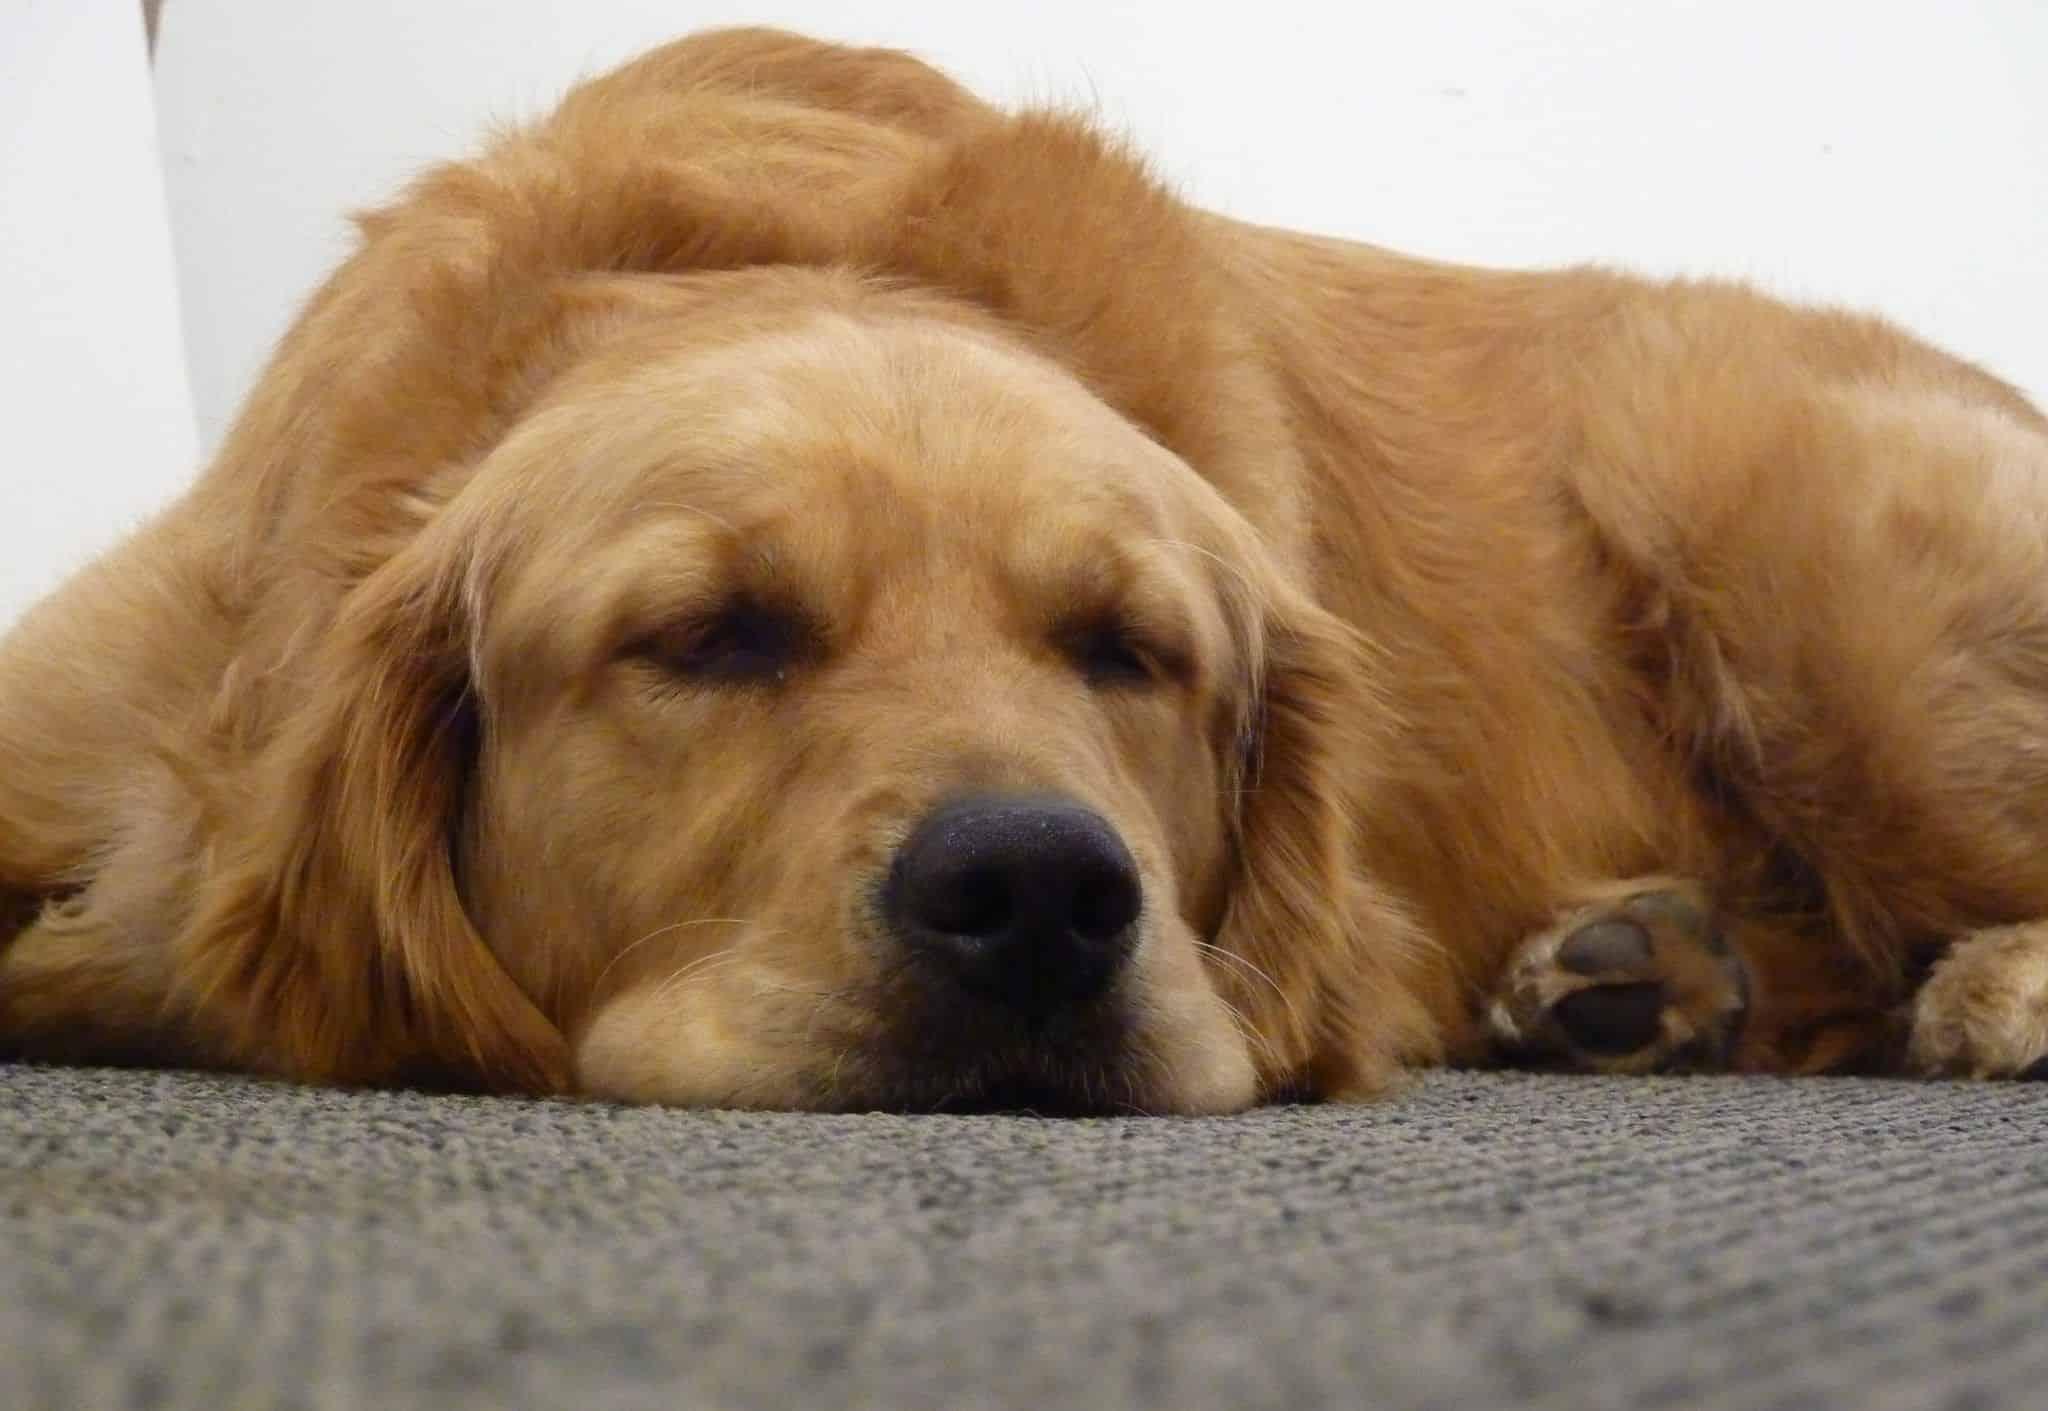 Golden Retriever durmiendo